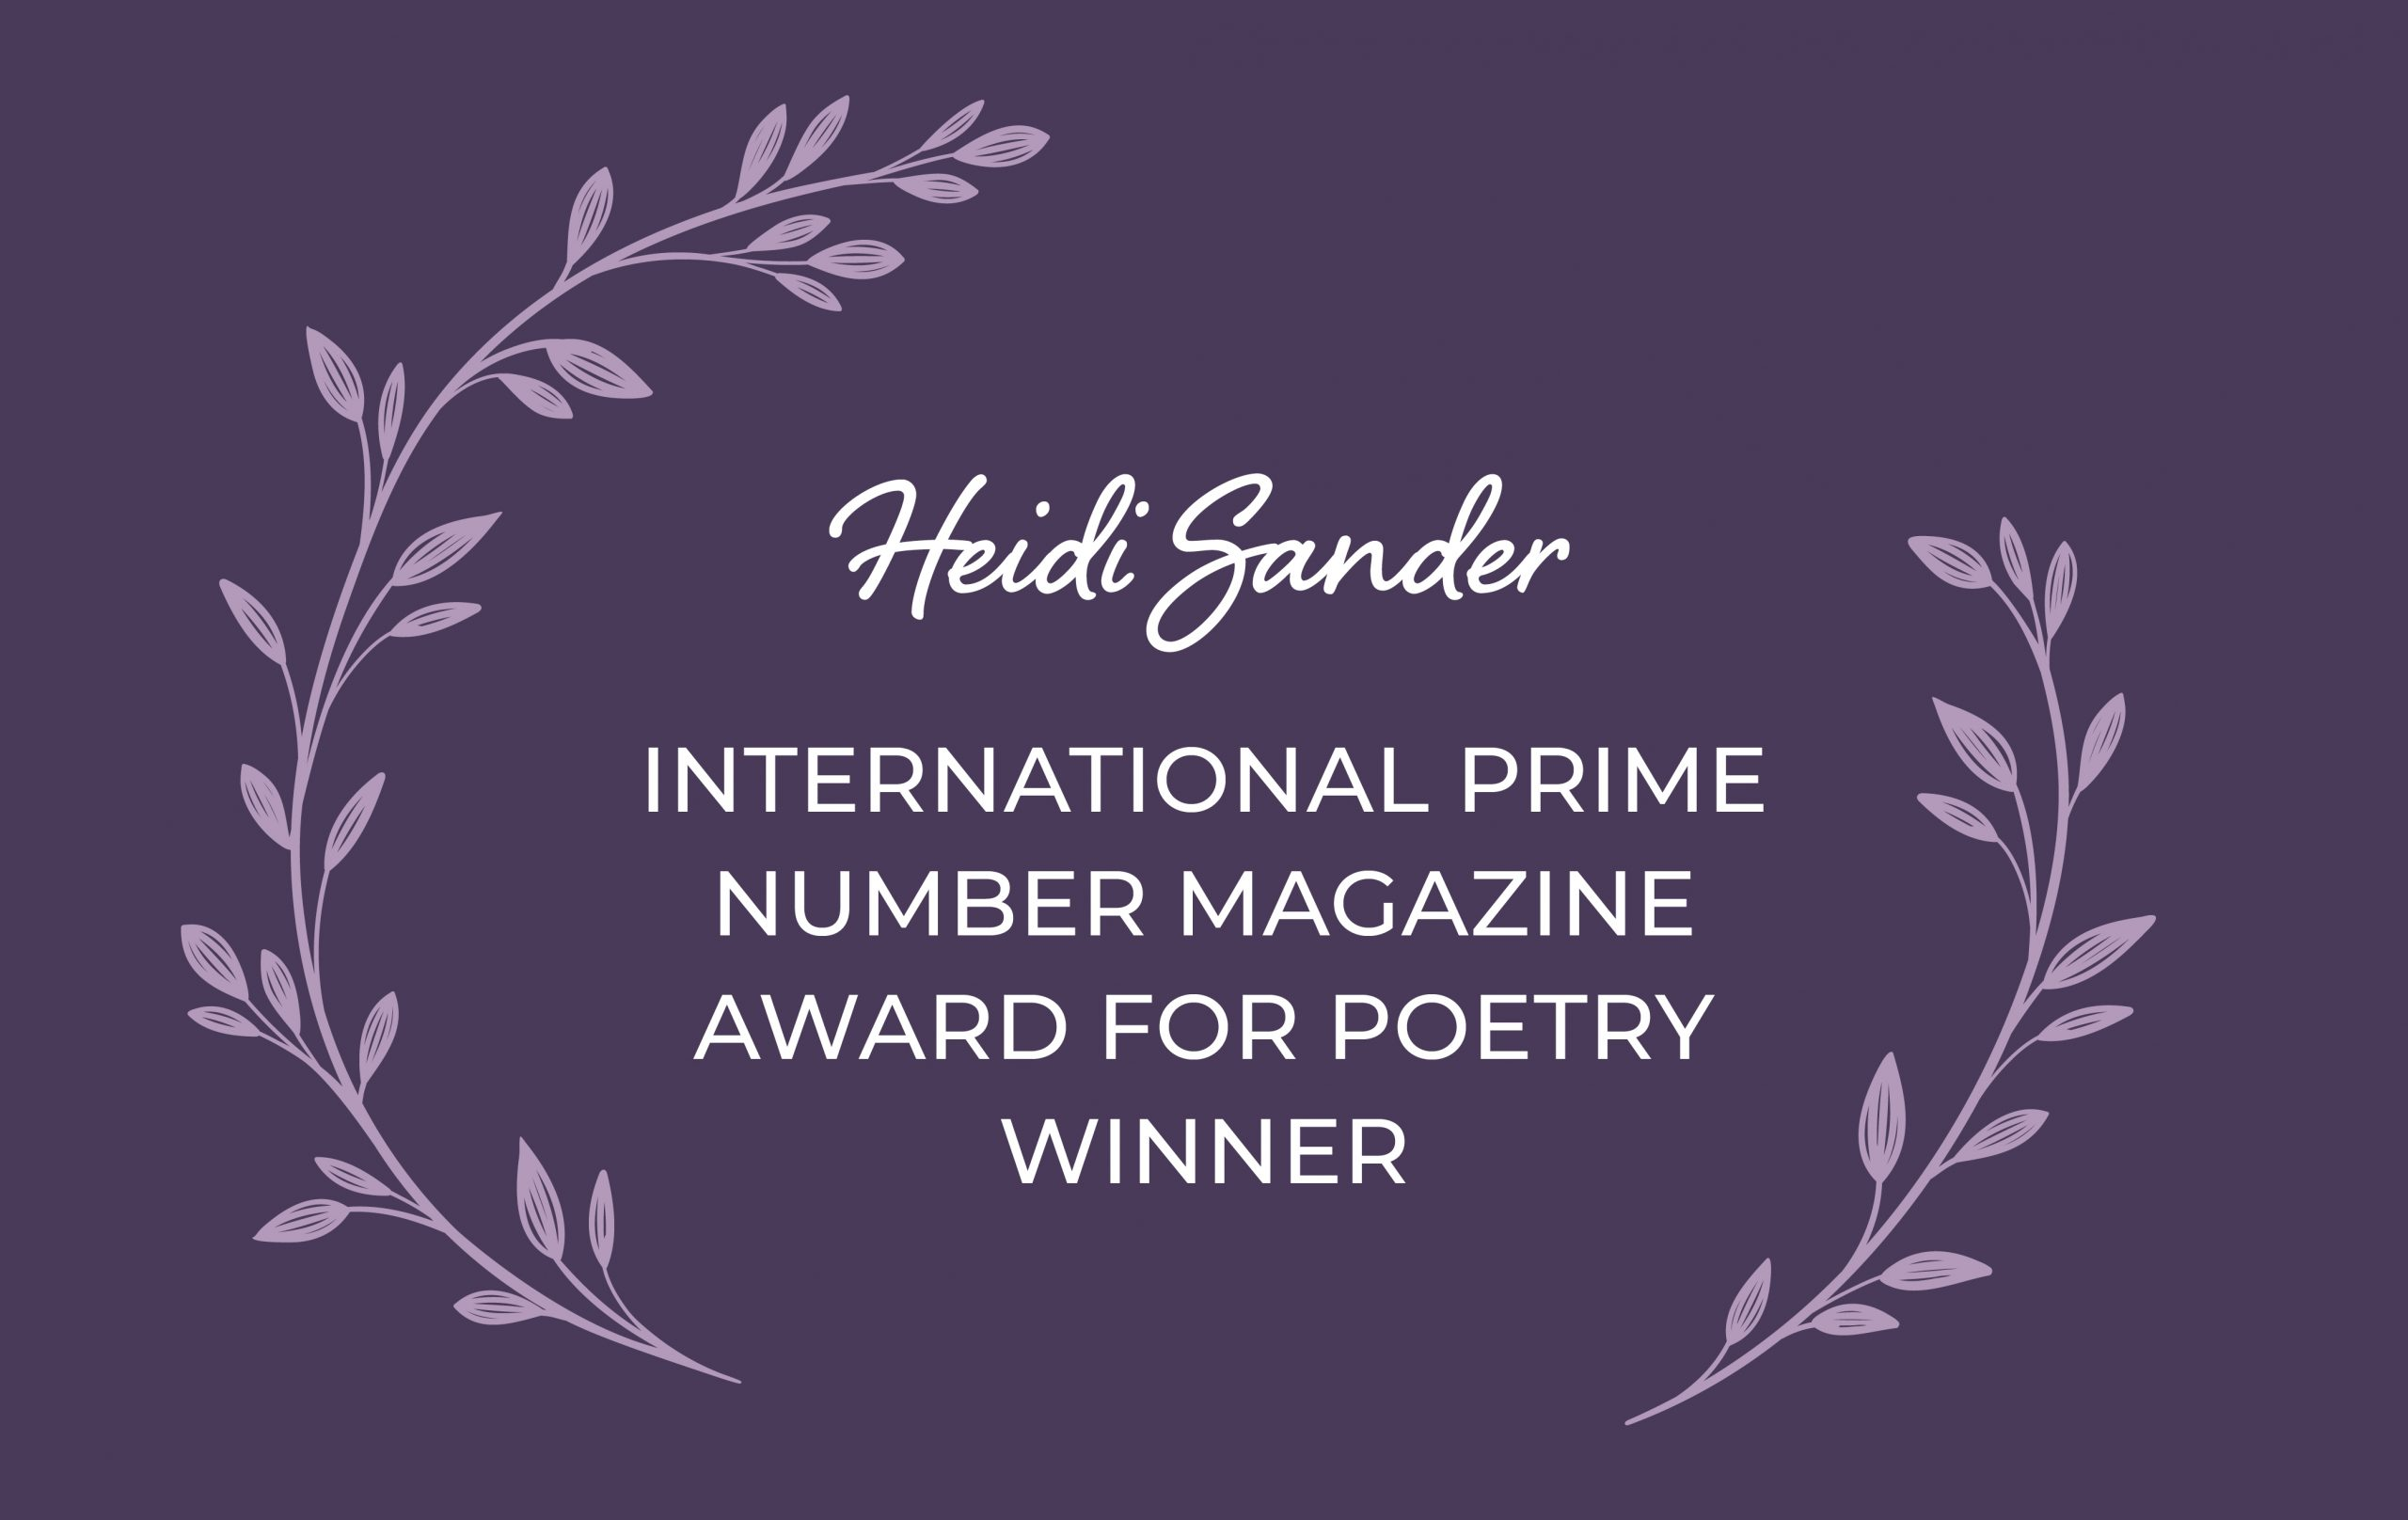 Award Winning Poet Heidi Sander